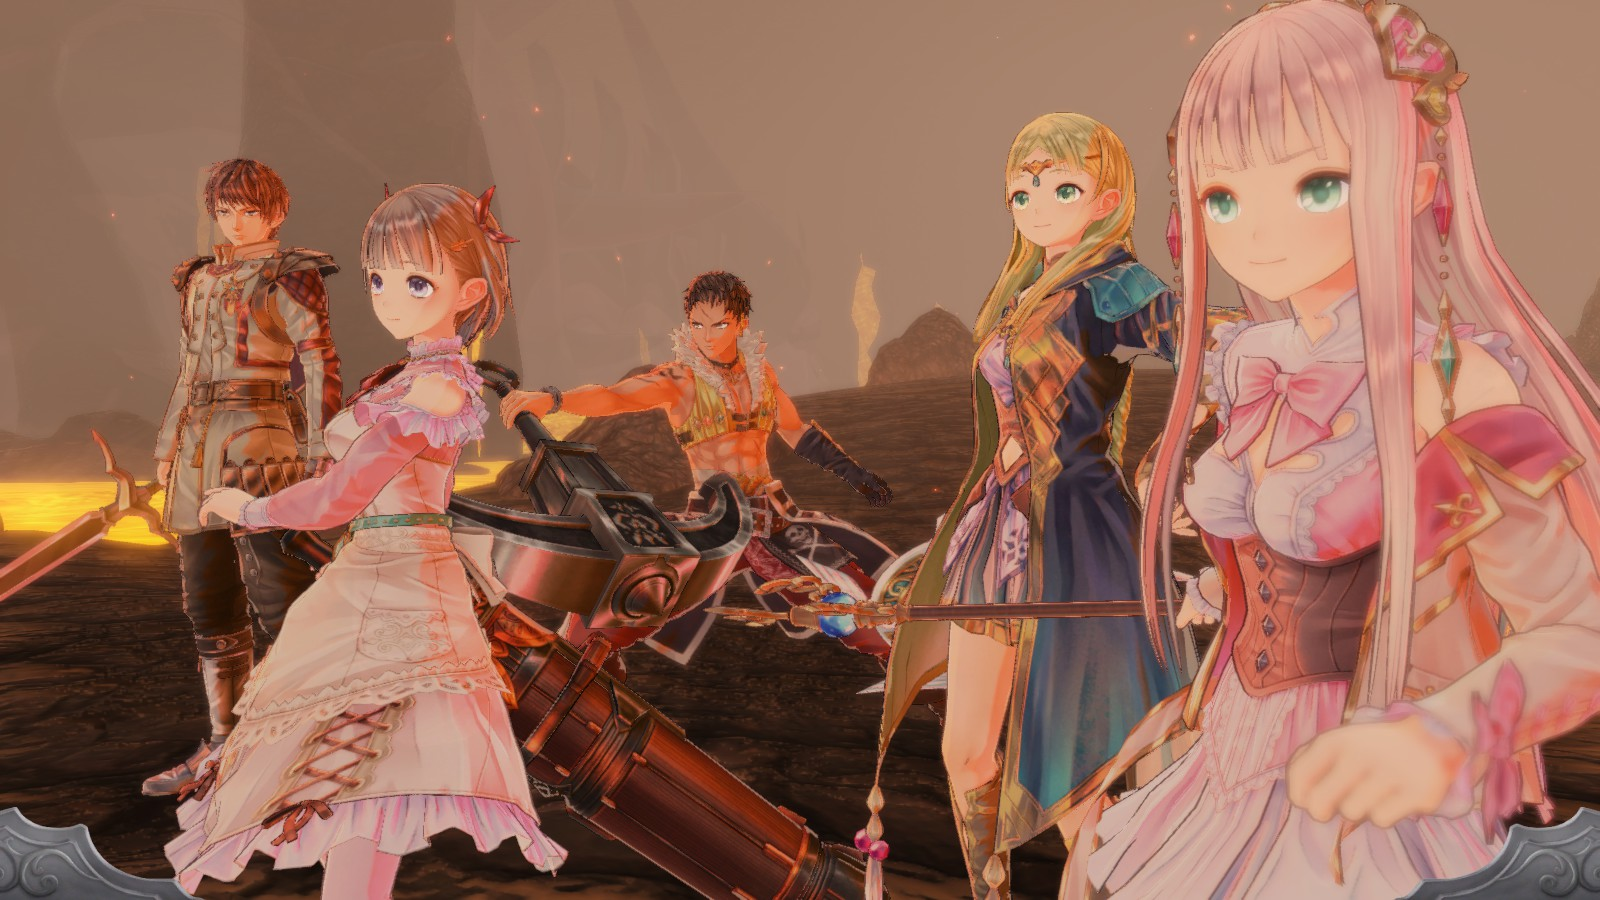 Atelier Lulua ~The Scion of Arland~ / ルルアのアトリエ ~アーランドの錬金術士4~ PC Fiyatları